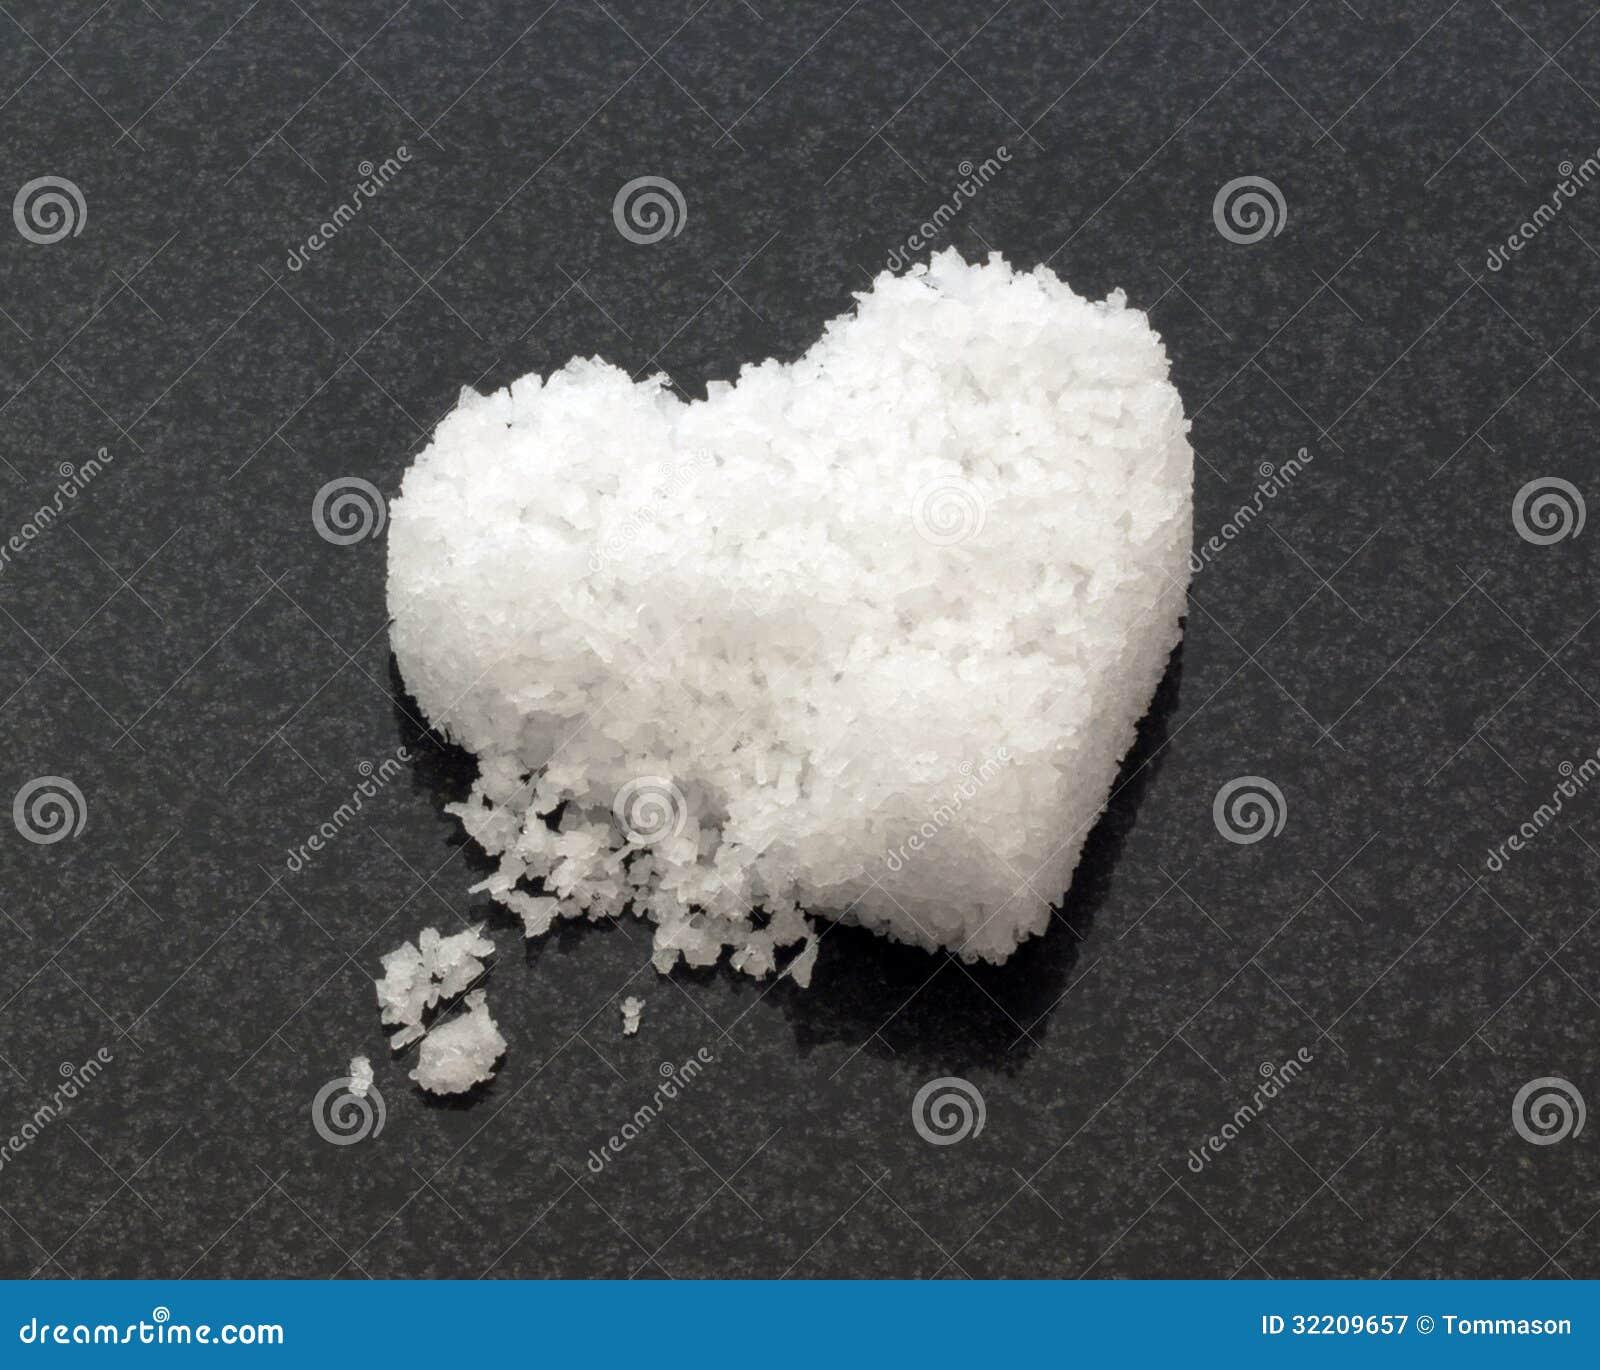 盐哺-m�f��dy.�9�b�/i_mr: no pr: no 2 501 2 盐 id 32209657 © tommason